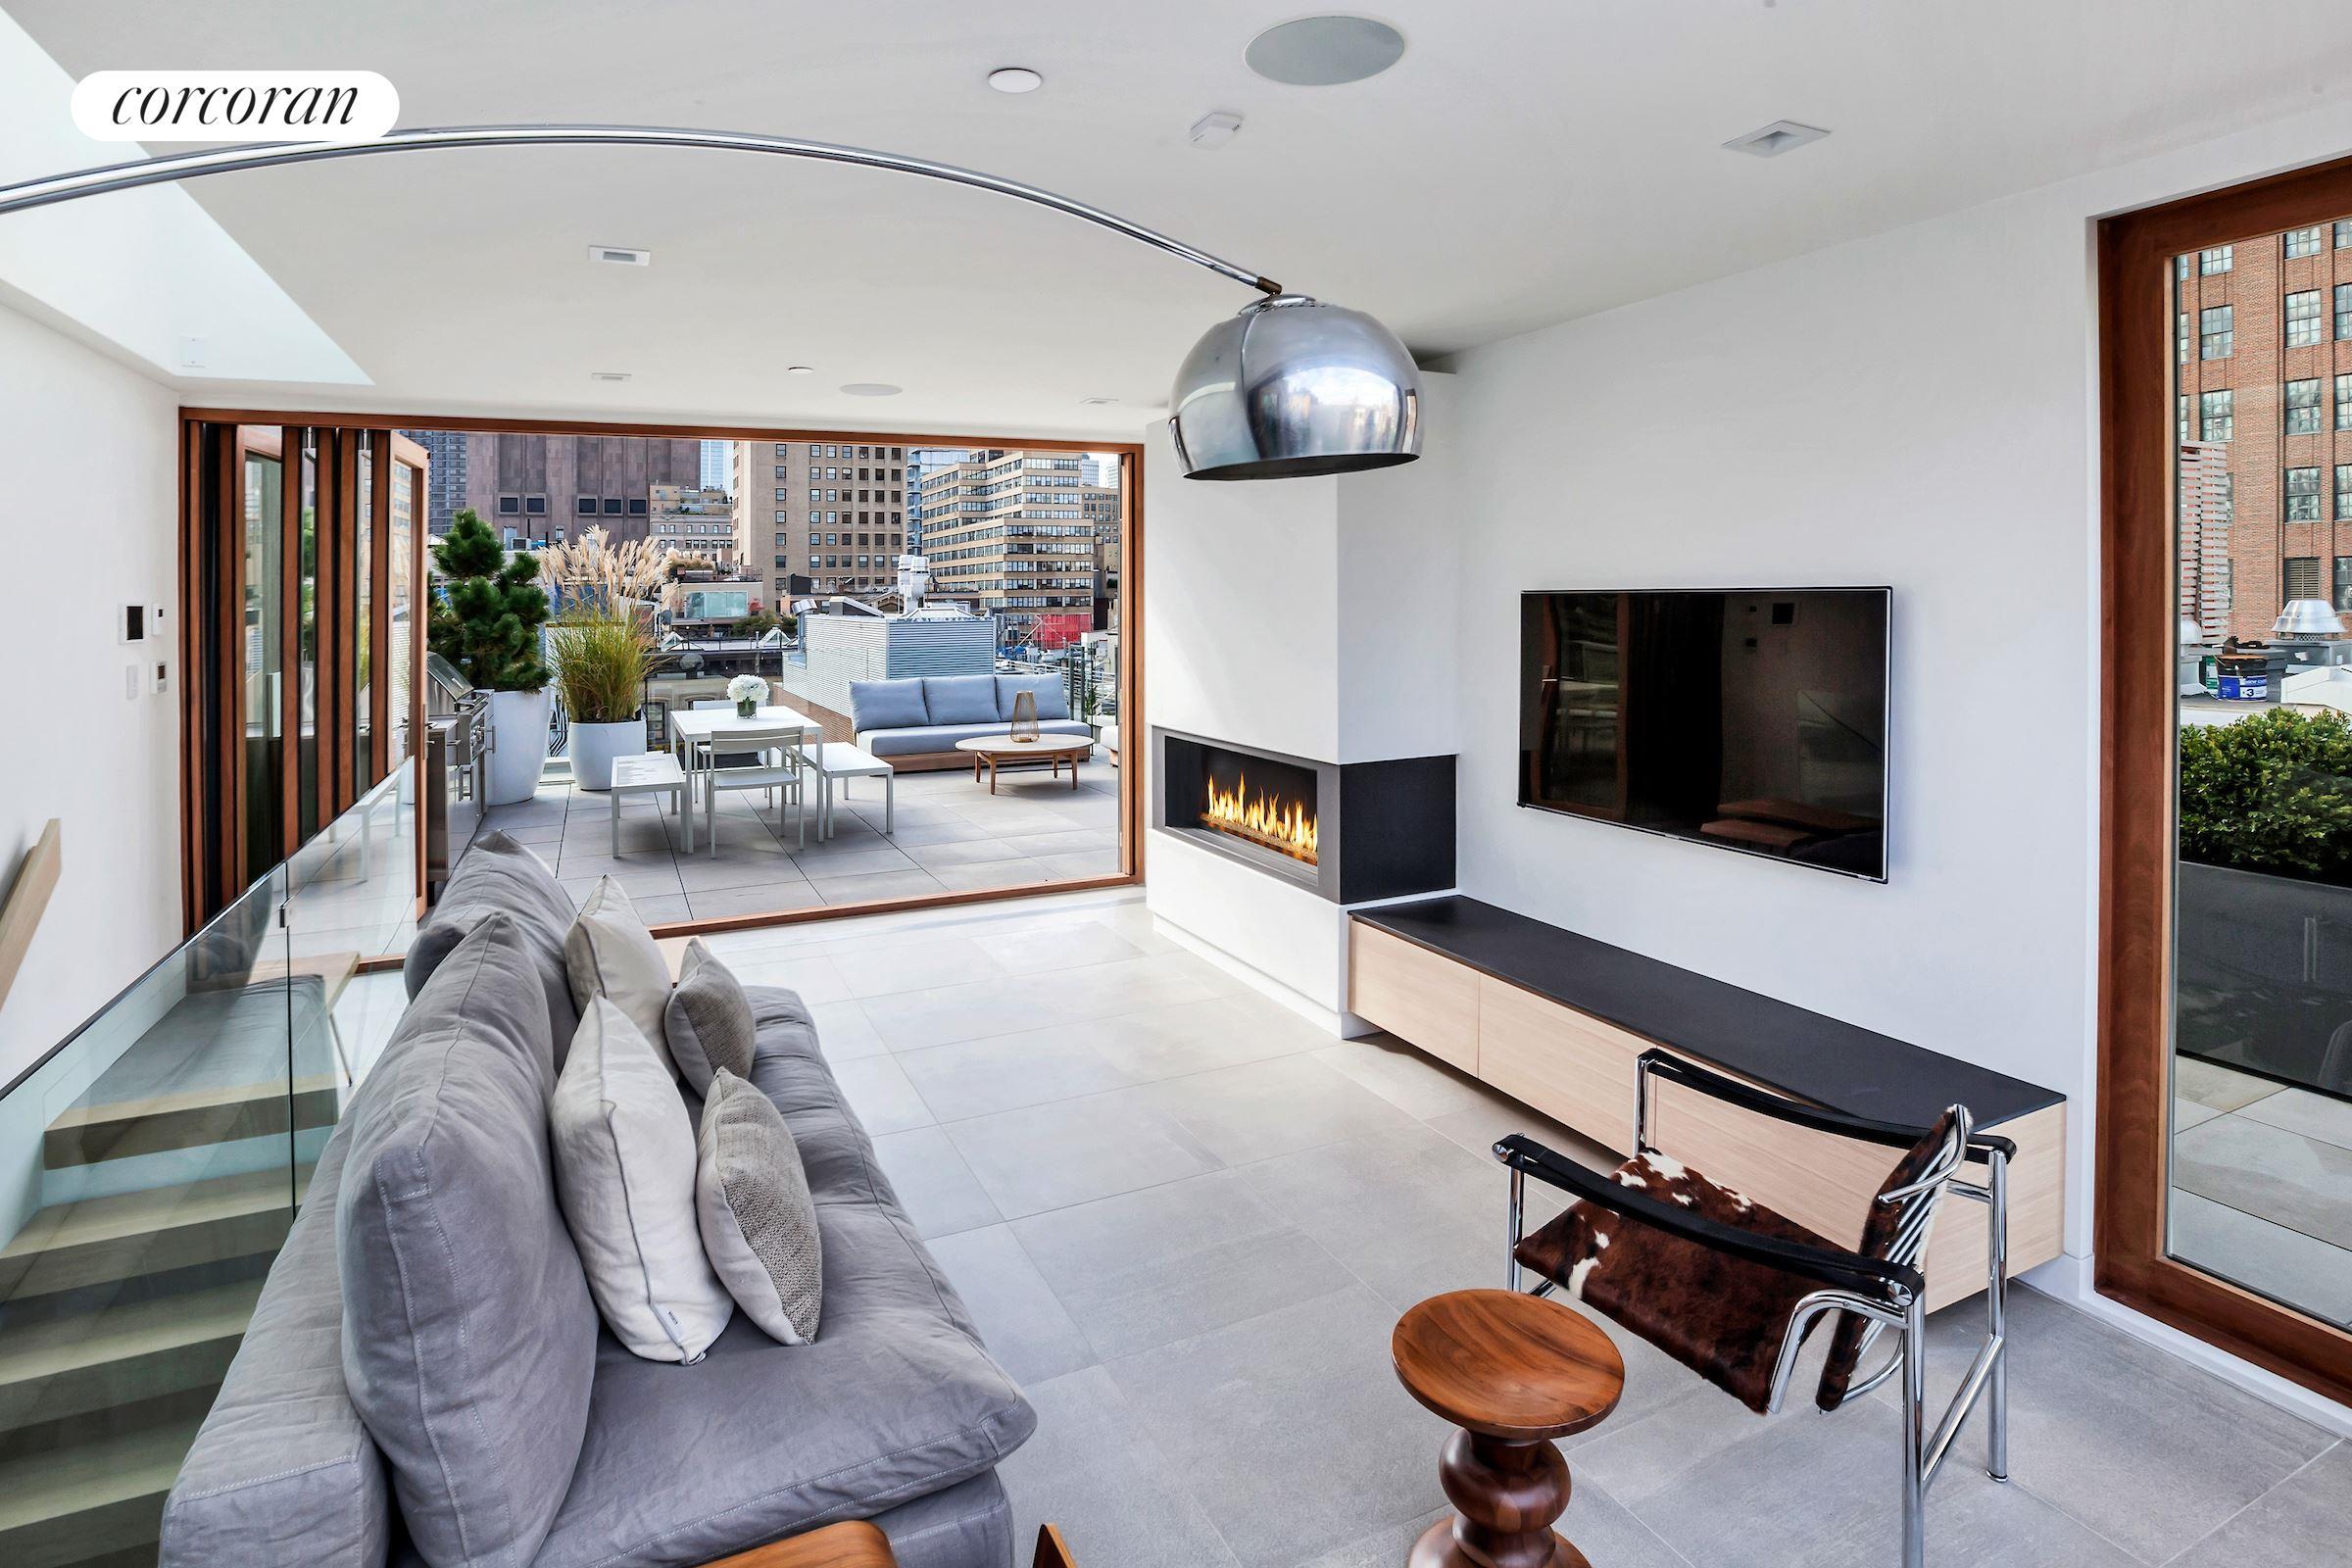 Corcoran, 44 LISPENARD ST, Apt. Penthouse, Tribeca Real Estate ...